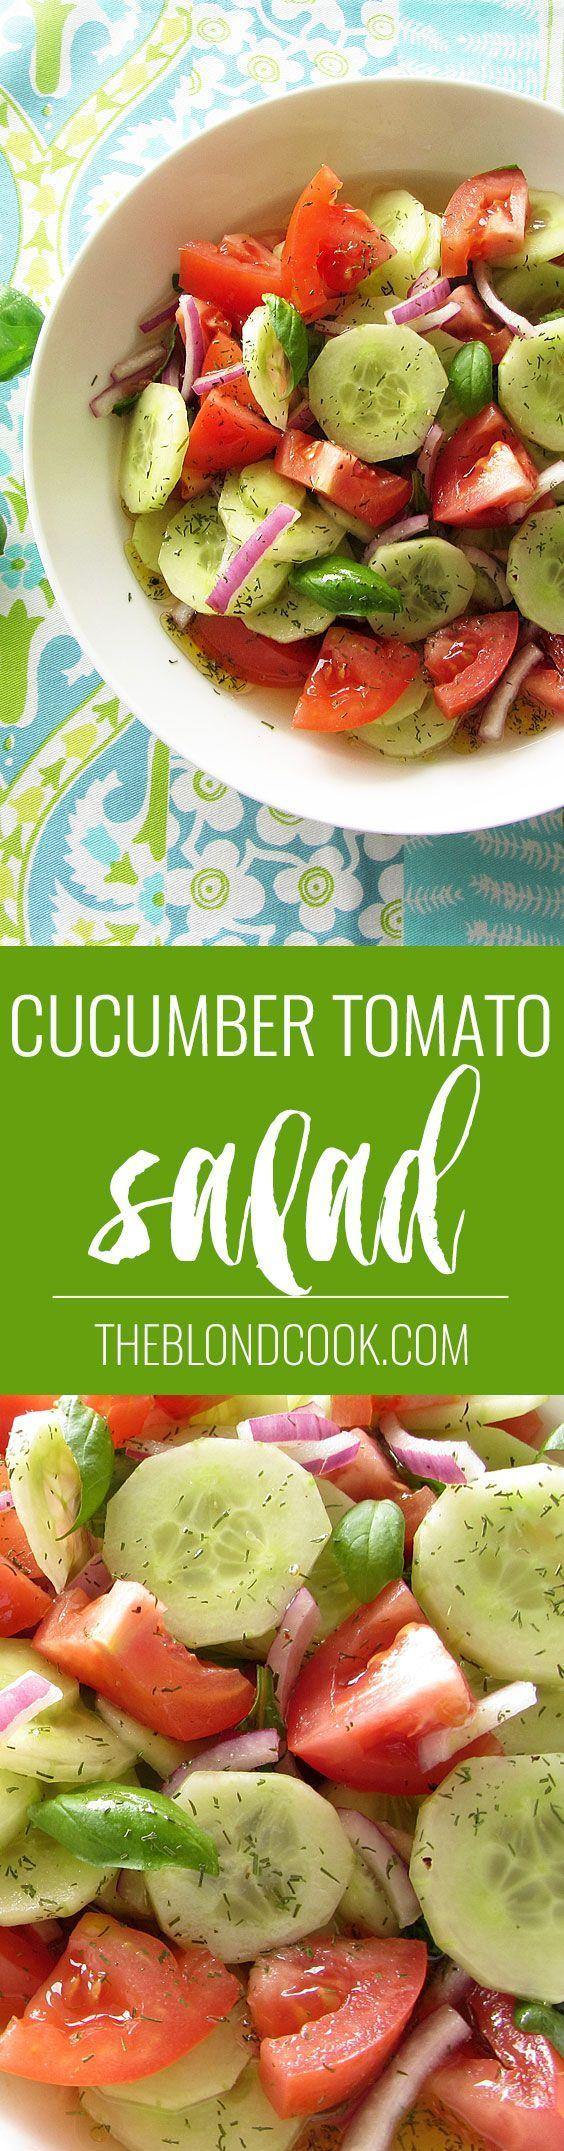 Cucumber Tomato Salad - A healthy salad with a homemade vinaigrette | theblondcook.com: